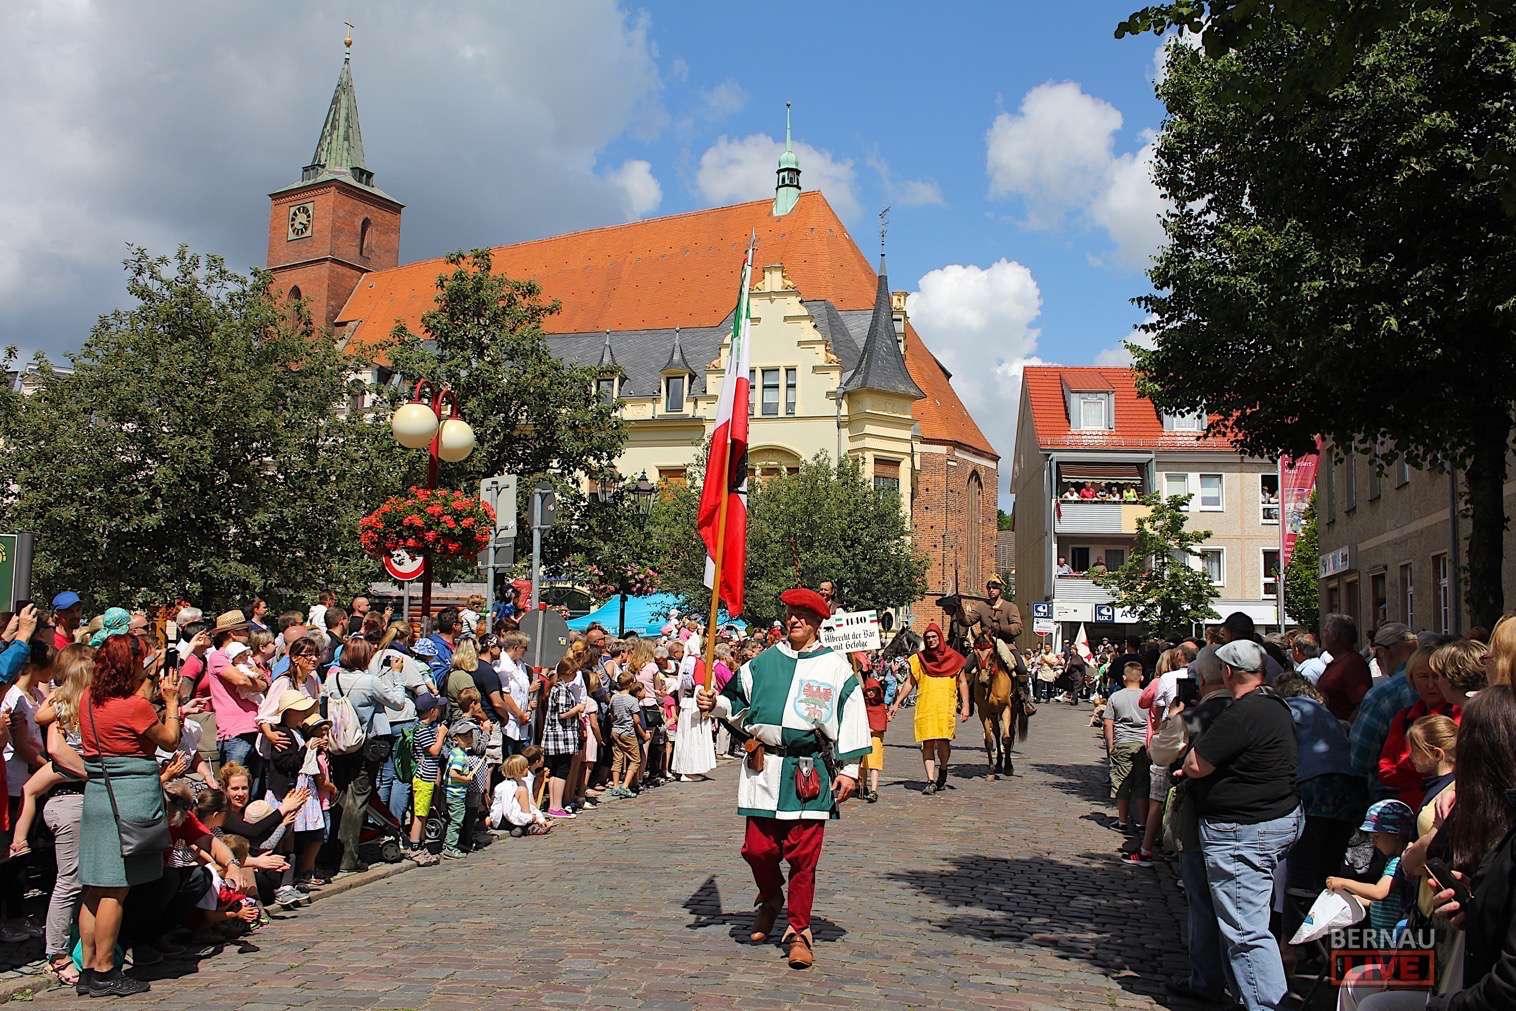 Hussitenfest Bernau - Video-Ausschnitte vom heutigen Festumzug